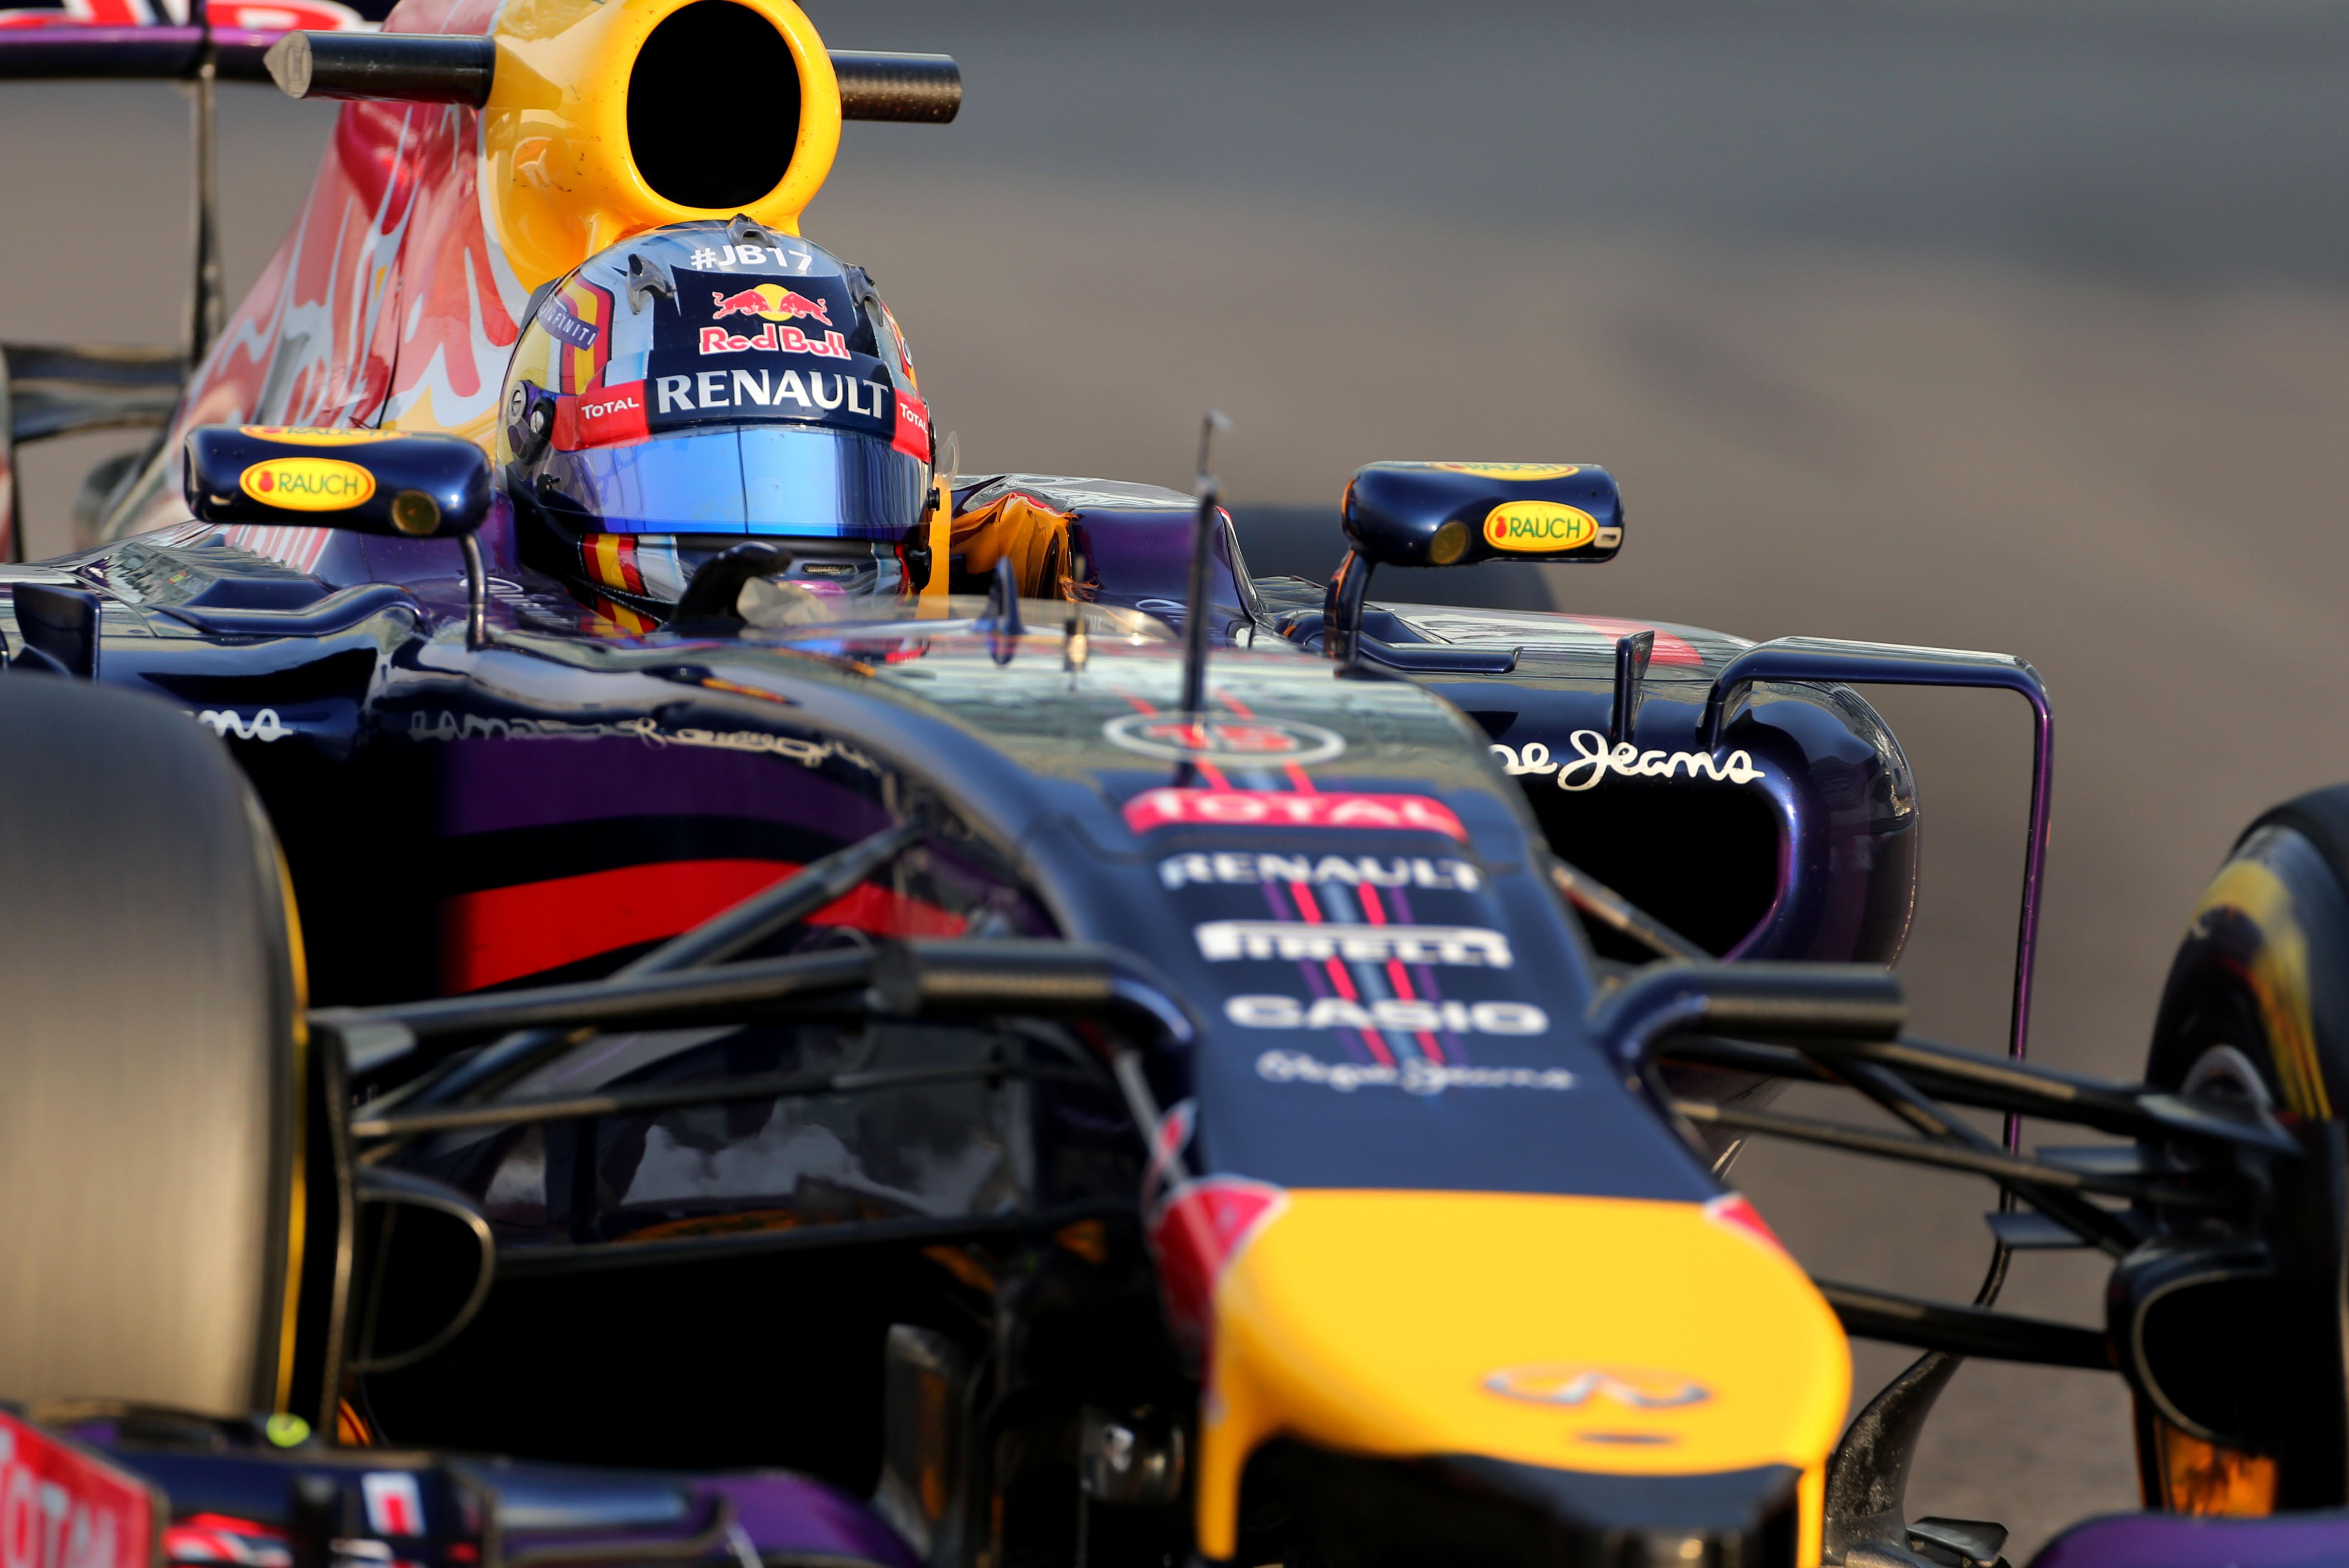 Carlos Sainz Jr Red Bull Abu Dhabi F1 testing 2014